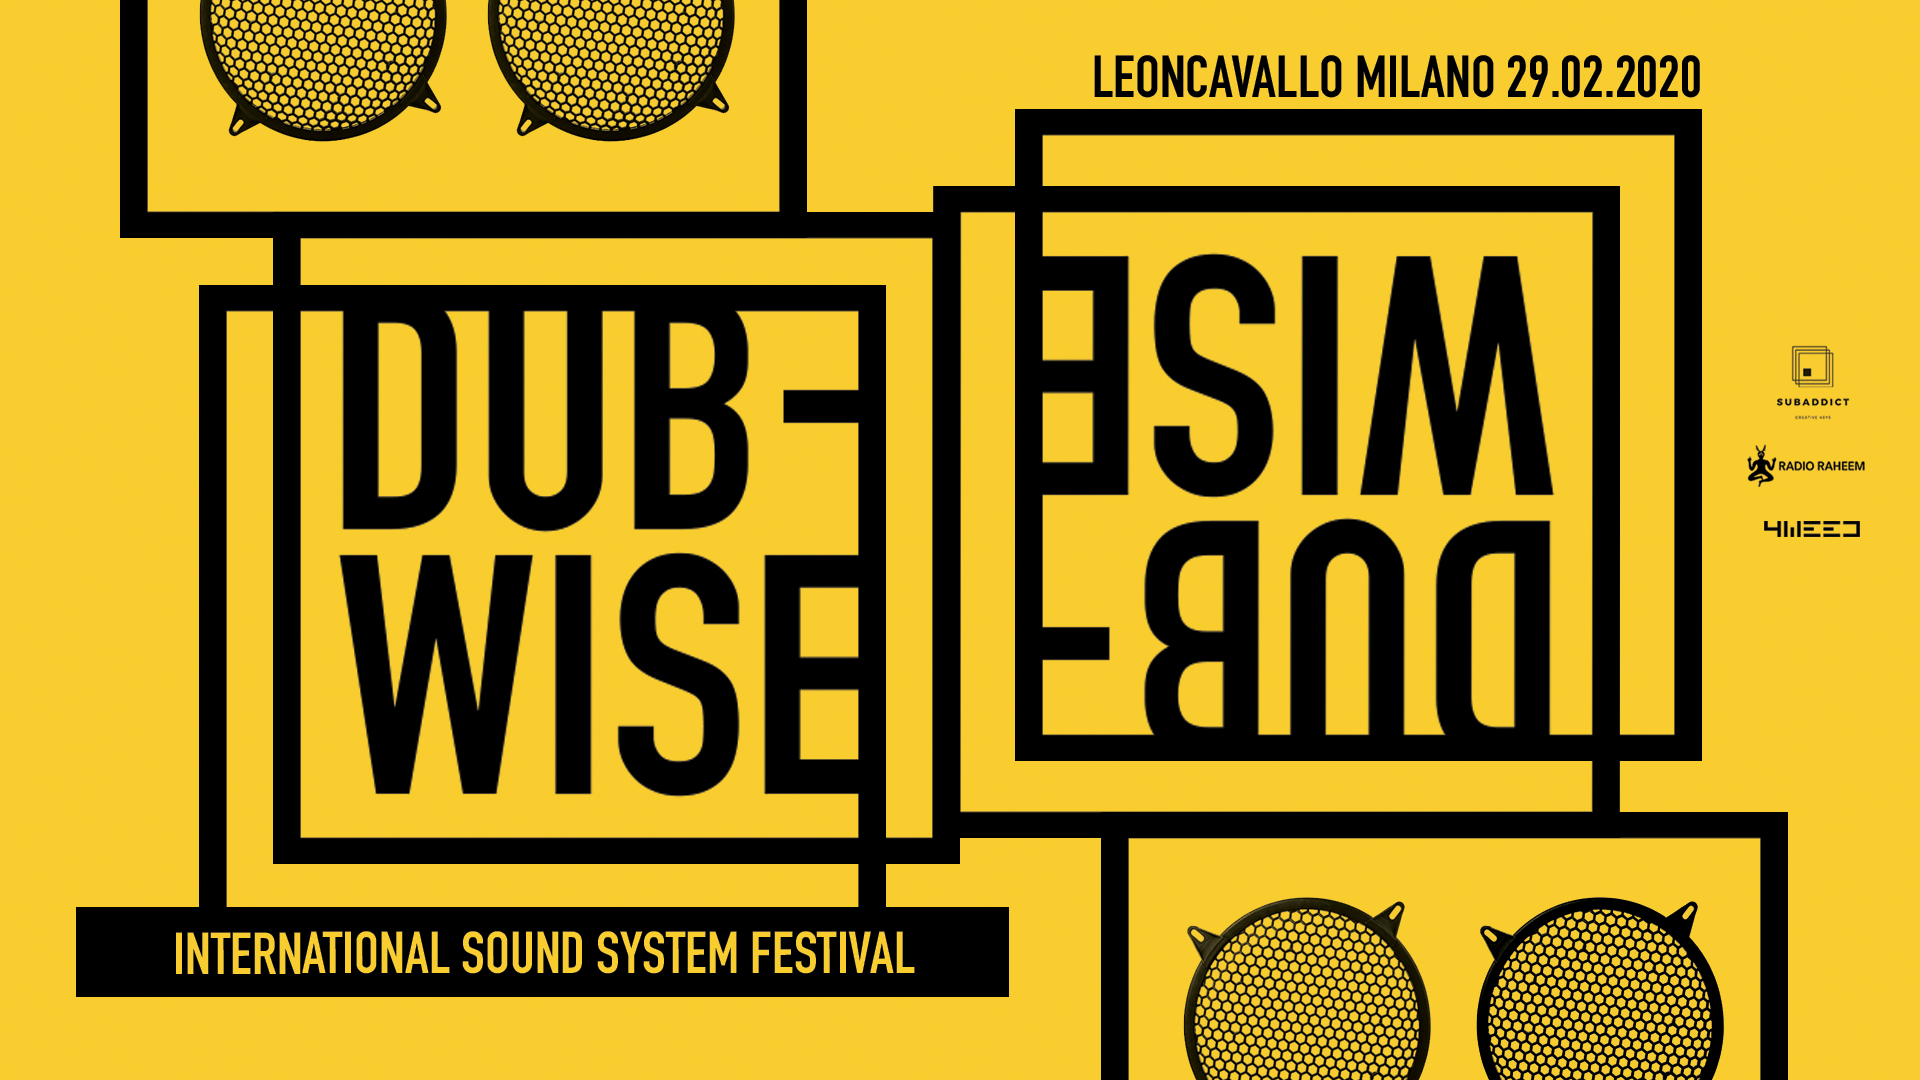 Dubwise Festival 2020